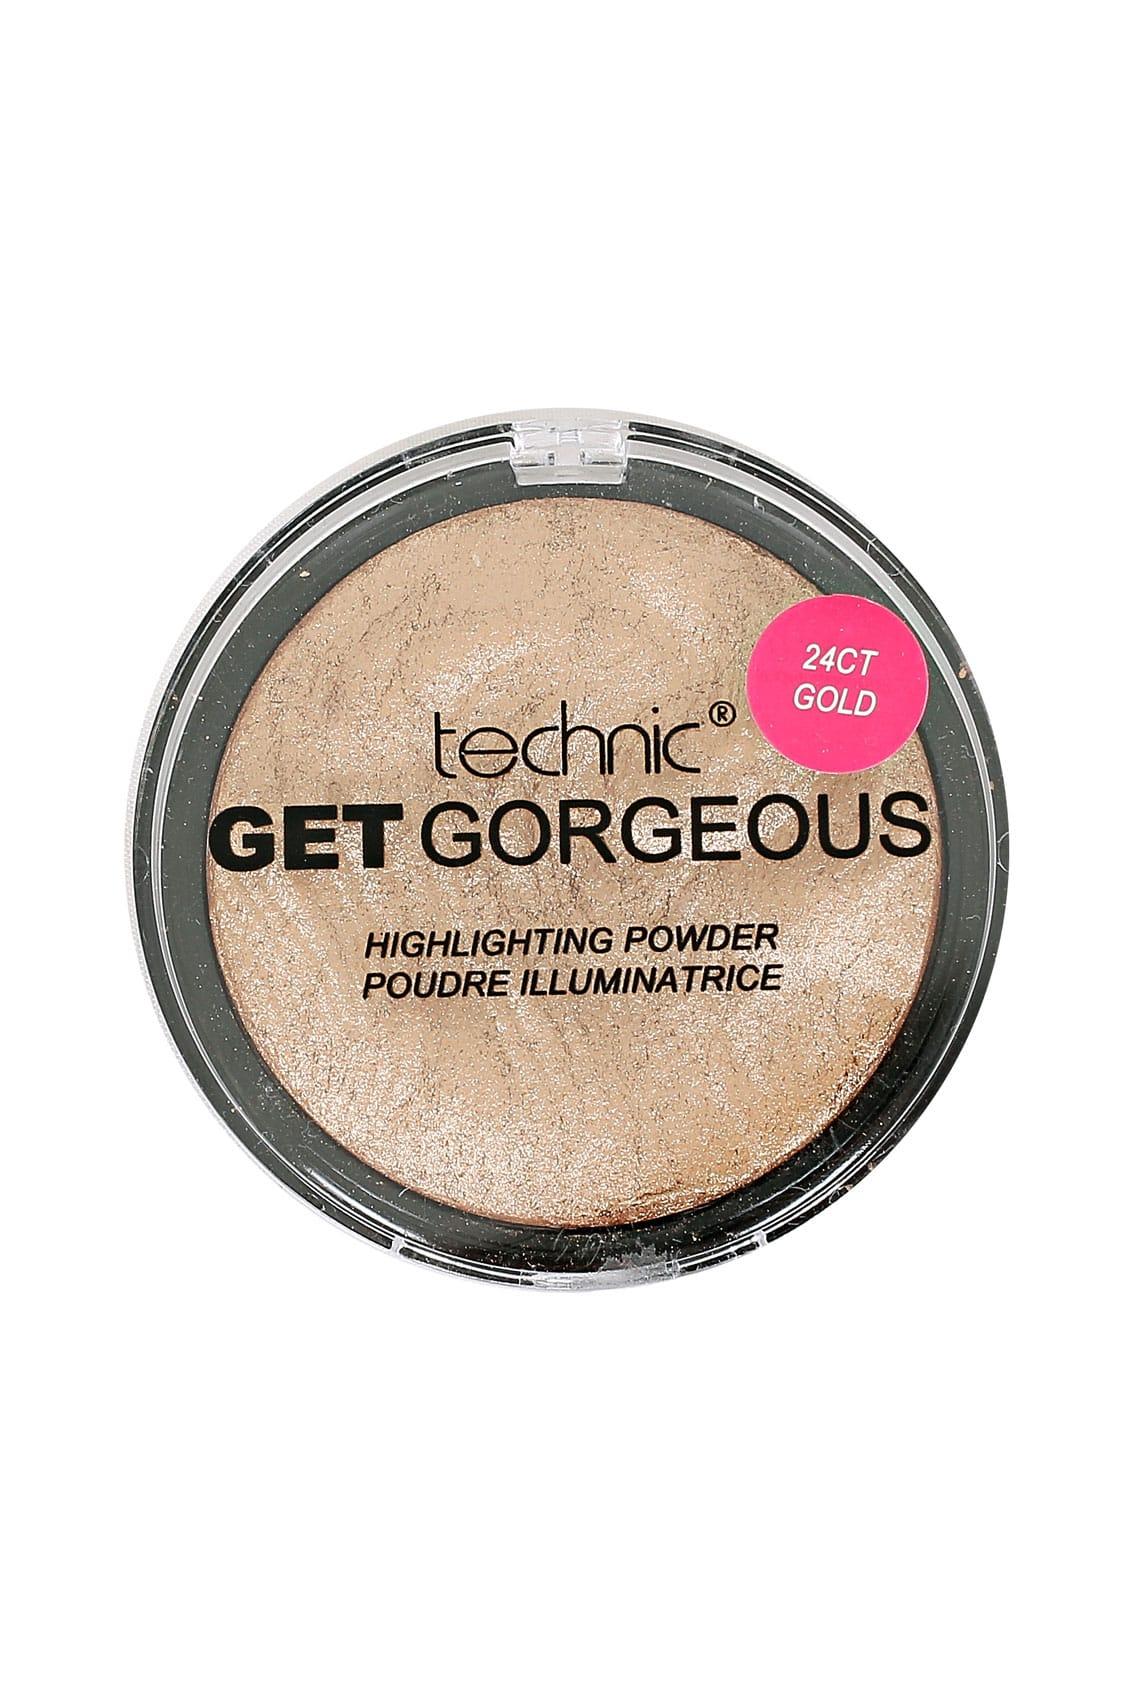 Technic Gold Get Gorgeous Highlighting Powder